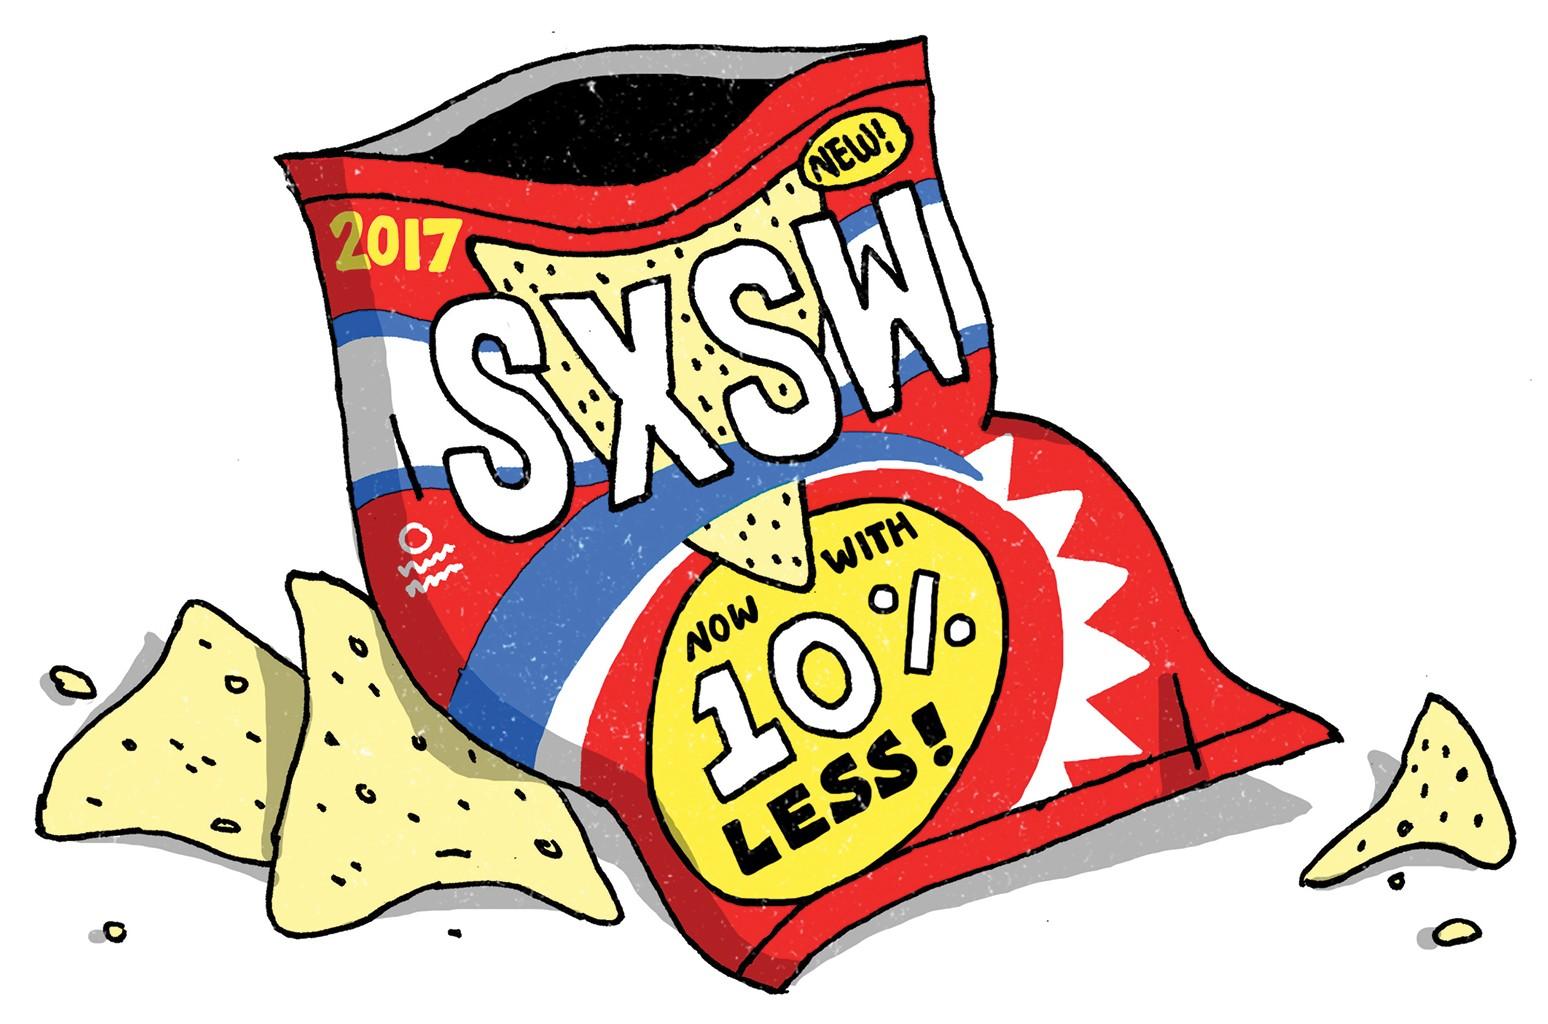 SXSW Chips